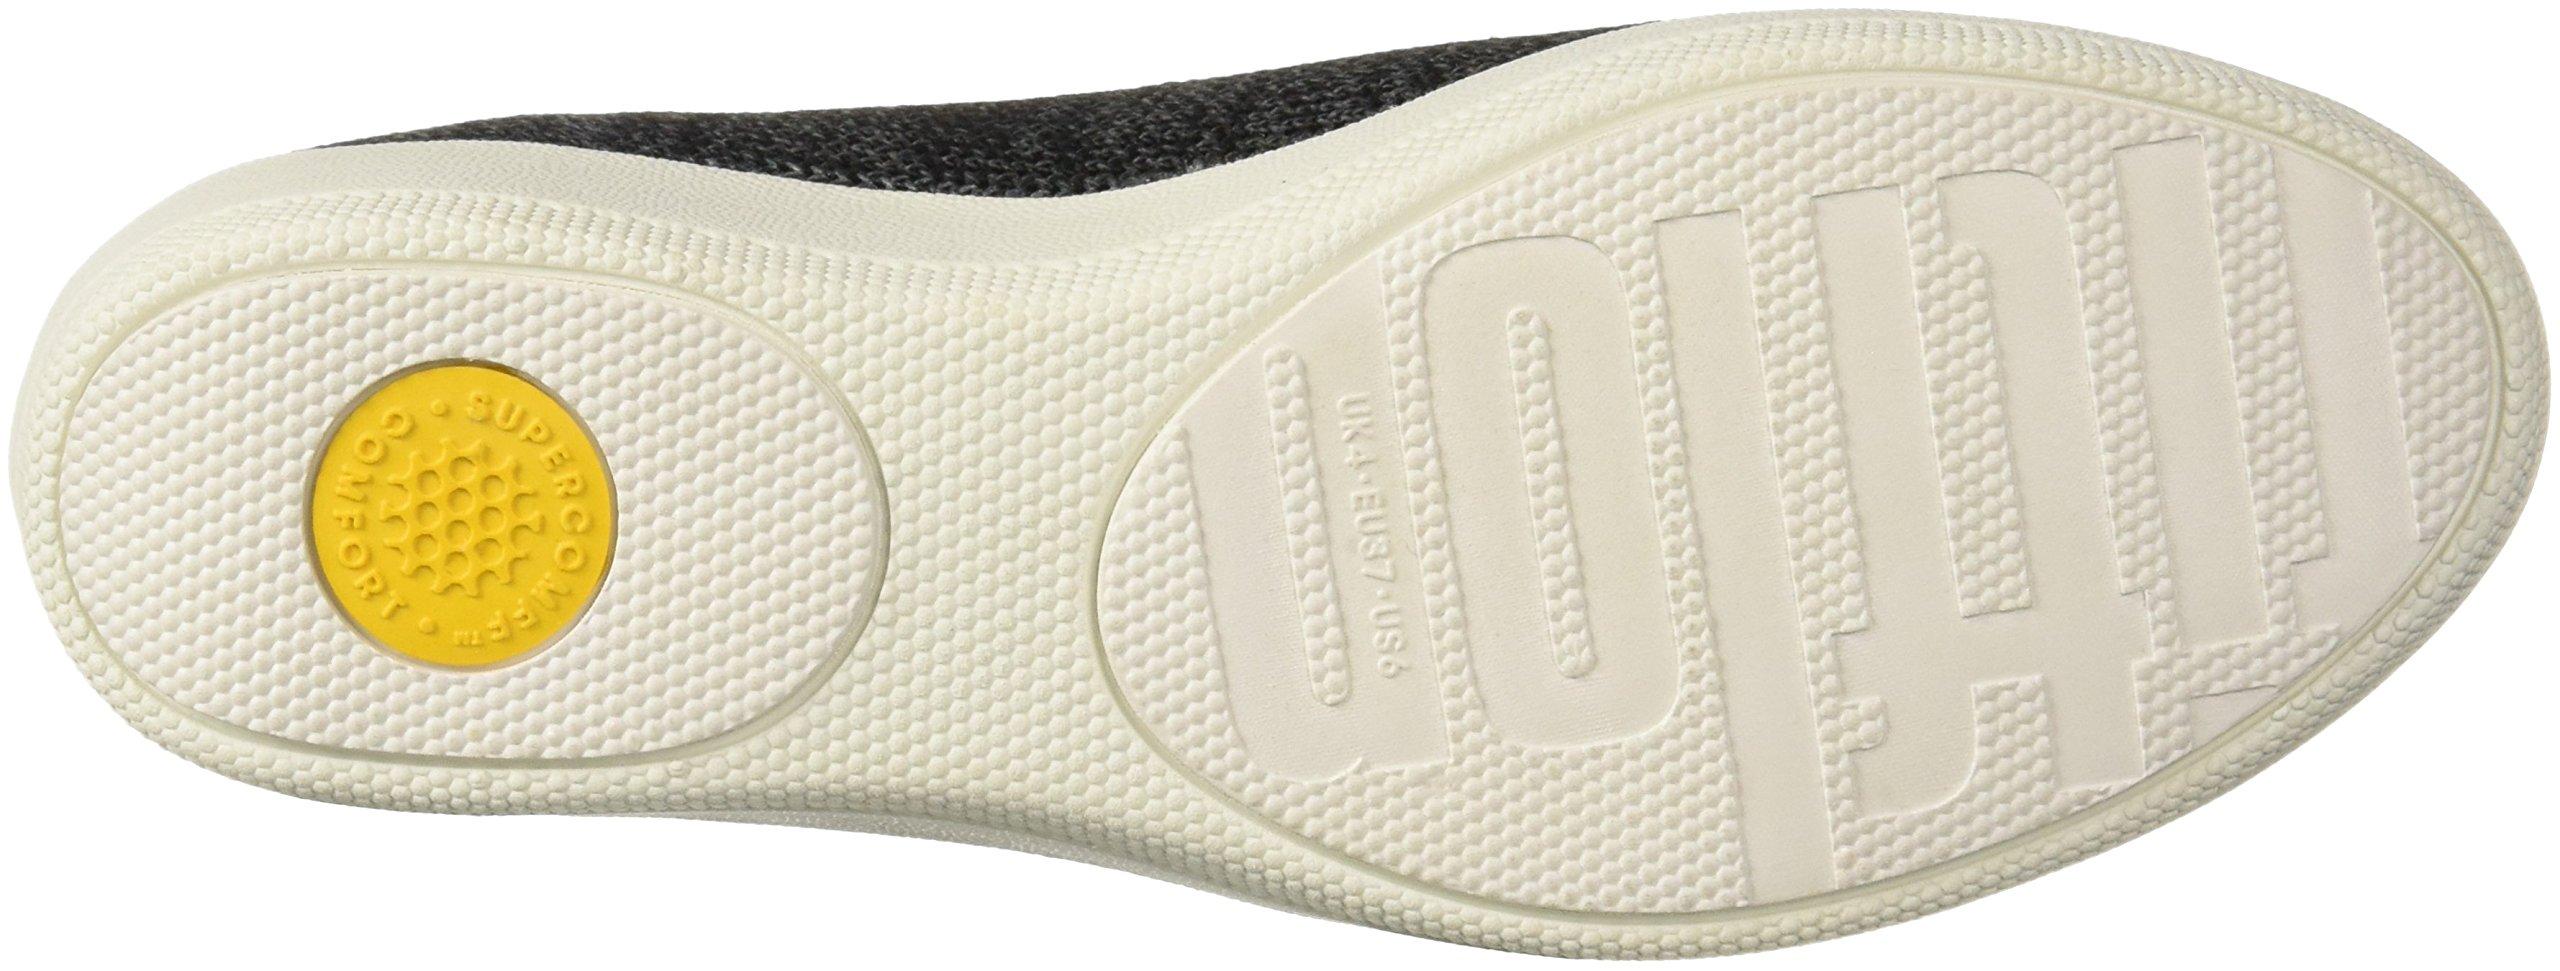 FitFlop Women's Superskate Uberknit Loafers, Black/Soft Grey, 8.5 M US by FitFlop (Image #3)